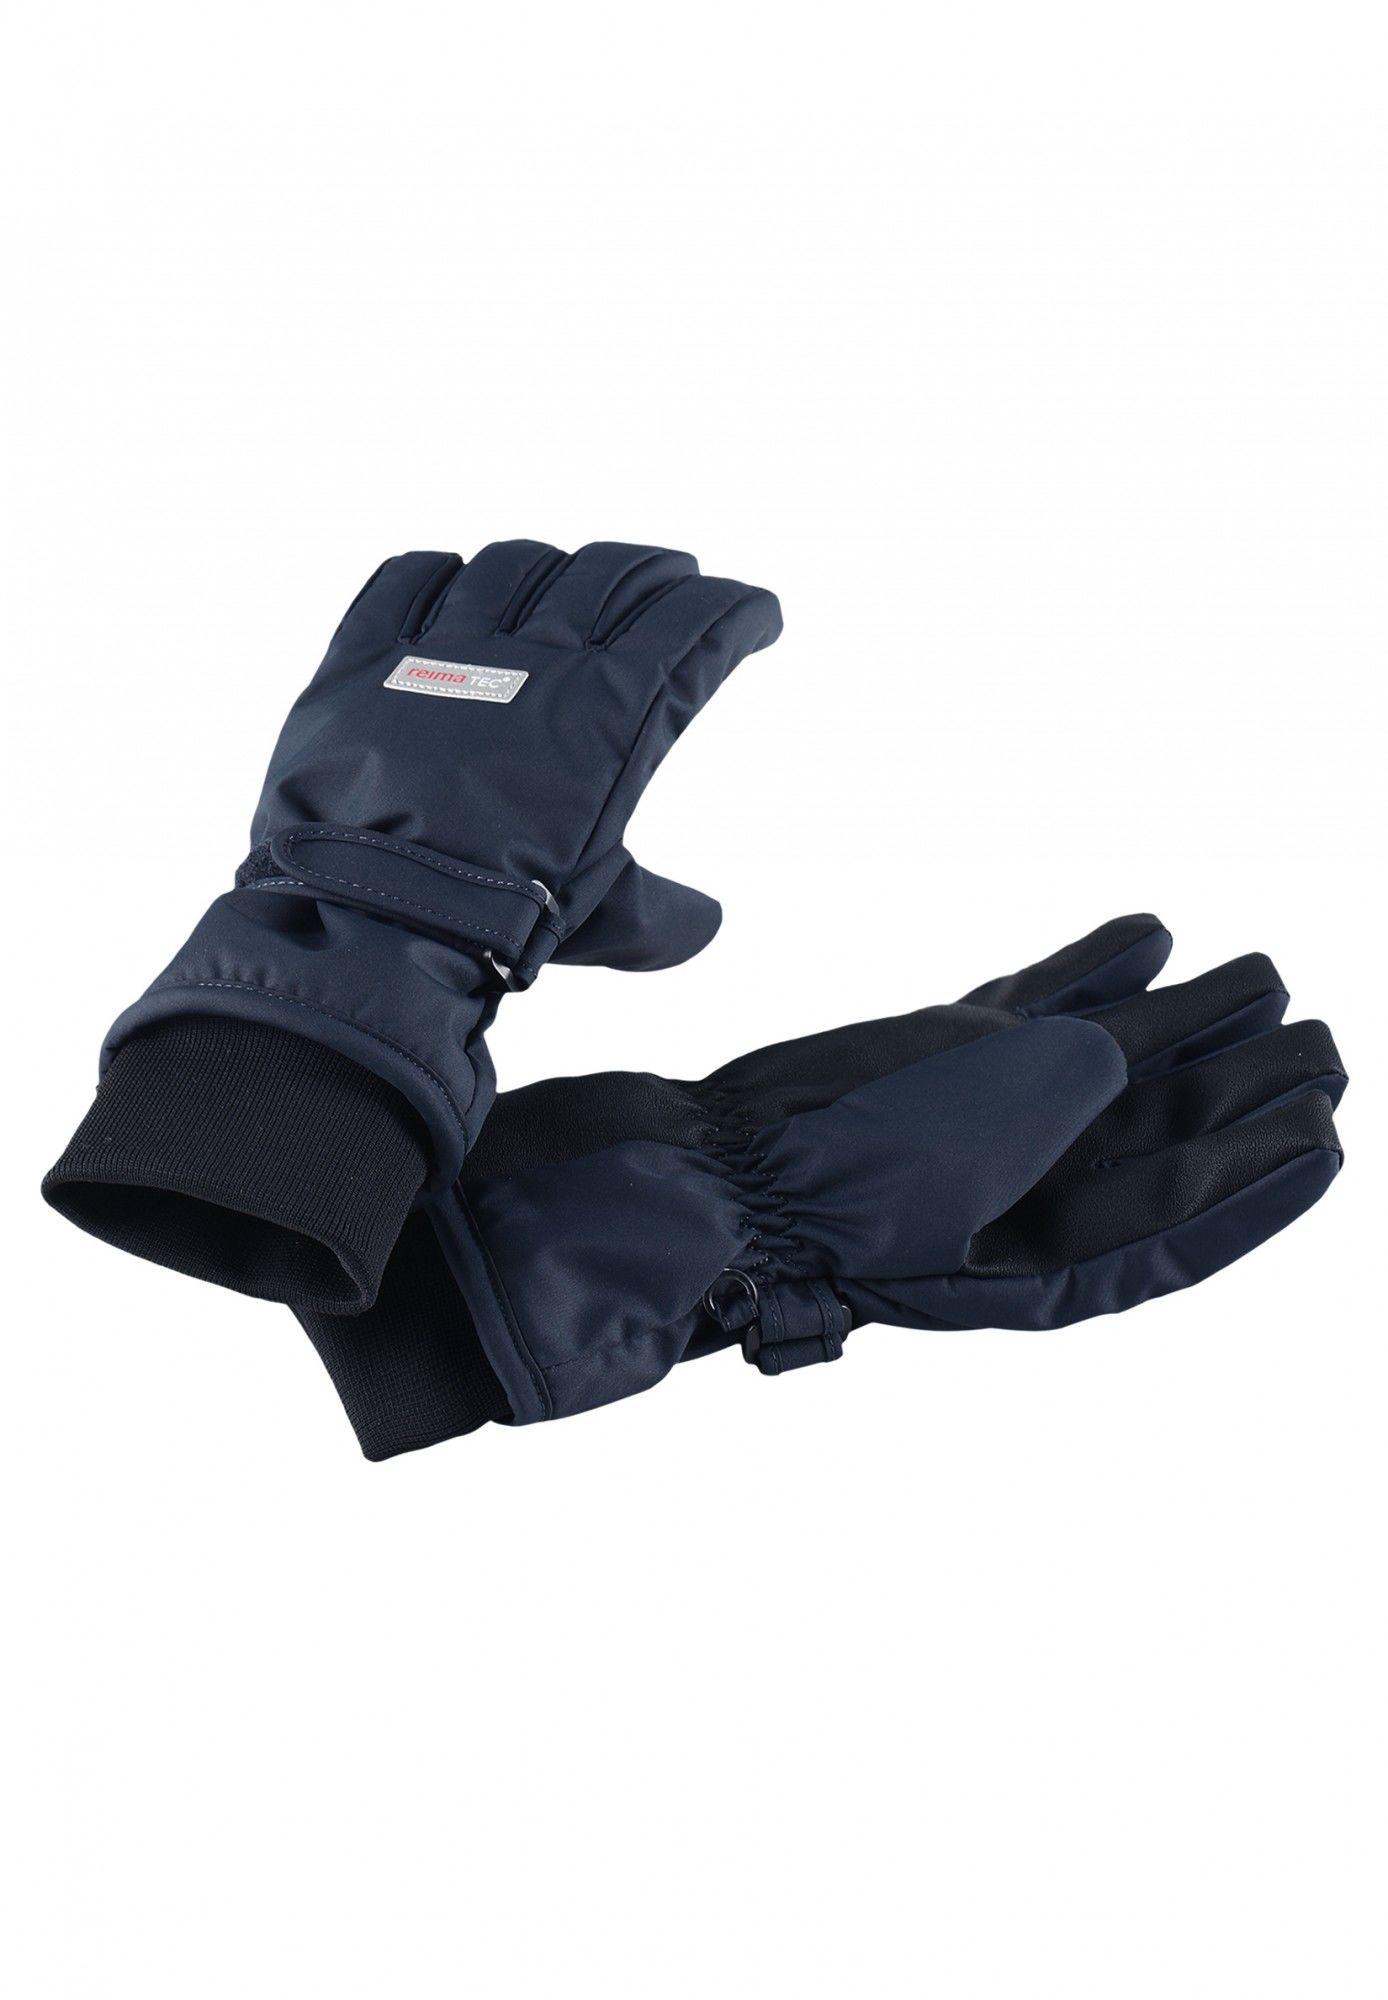 Reima Kids Tartu Gloves Blau, PrimaLoft® Accessoires, 8